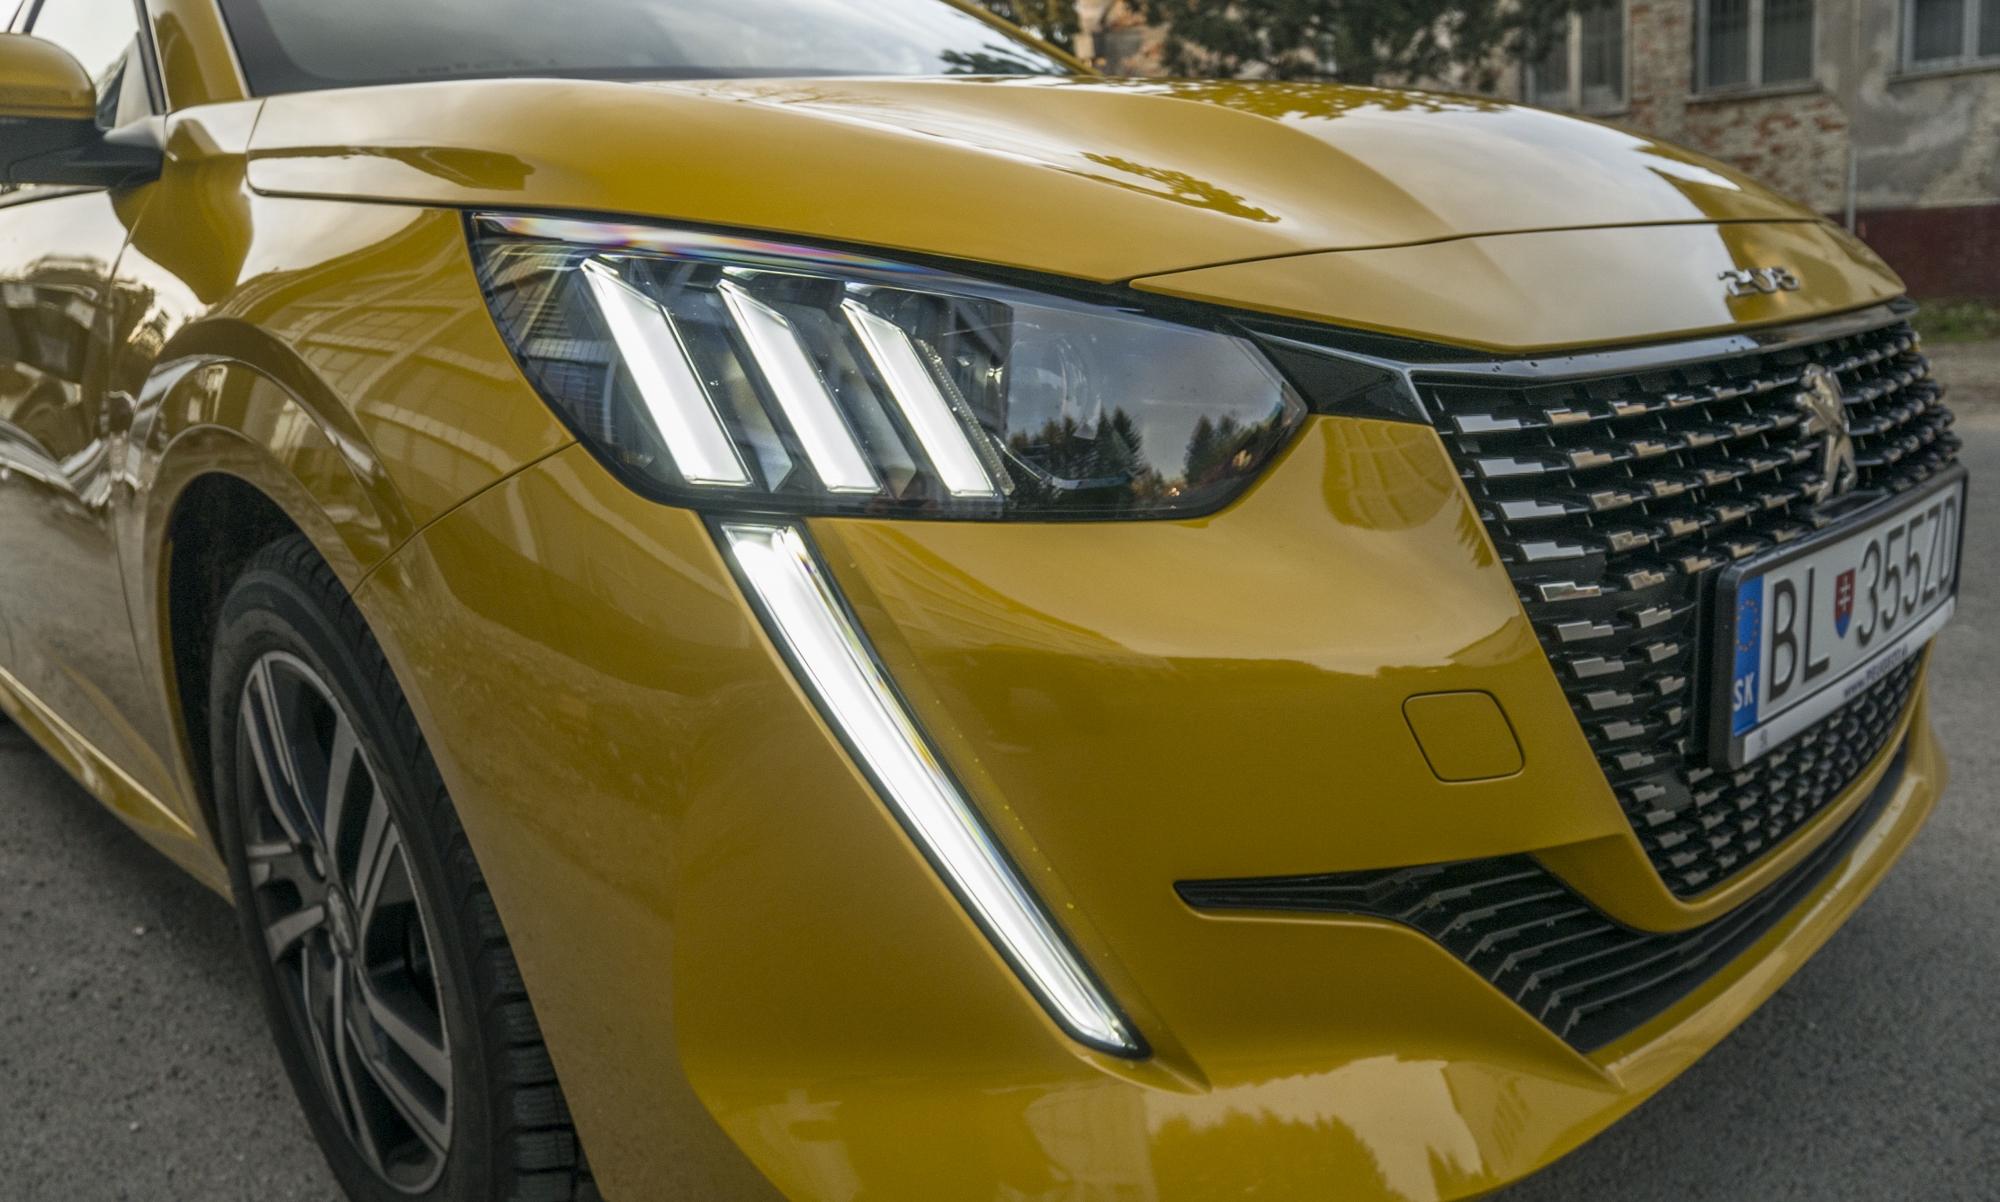 Test: Peugeot 208 prekvapivo pútal pohľady KgITVrOsBA peugeot-208-18